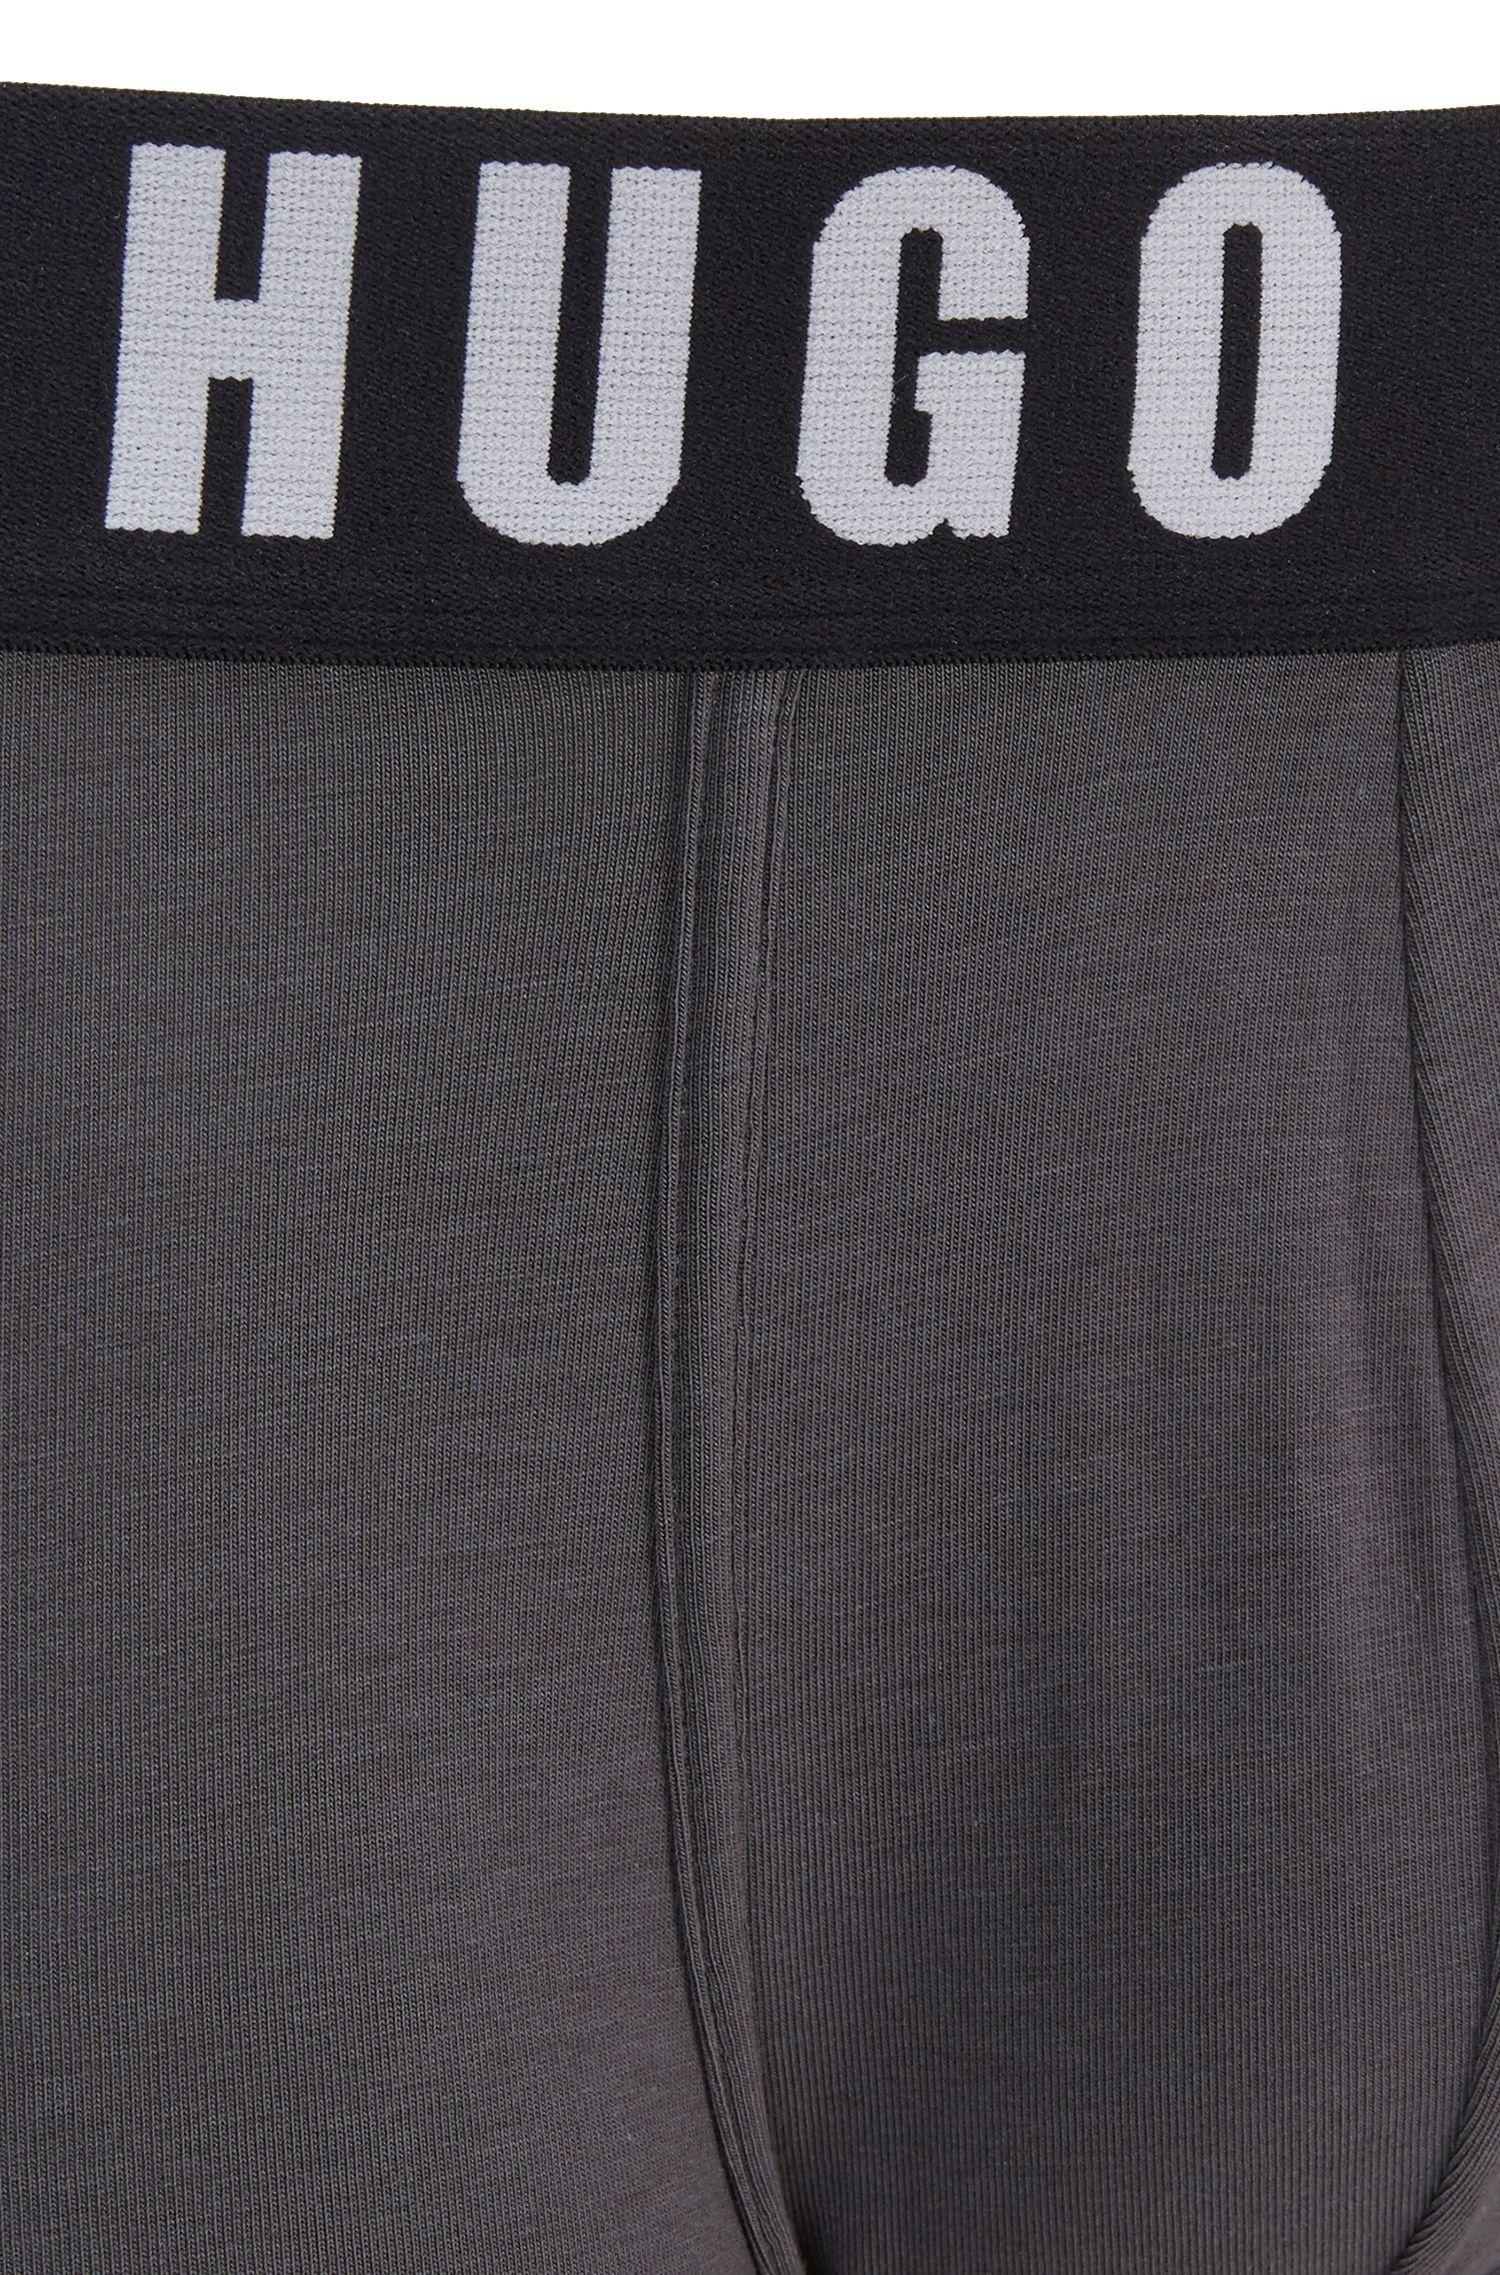 Mittelhohe Boxershorts aus Baumwoll-Mix mit Modal